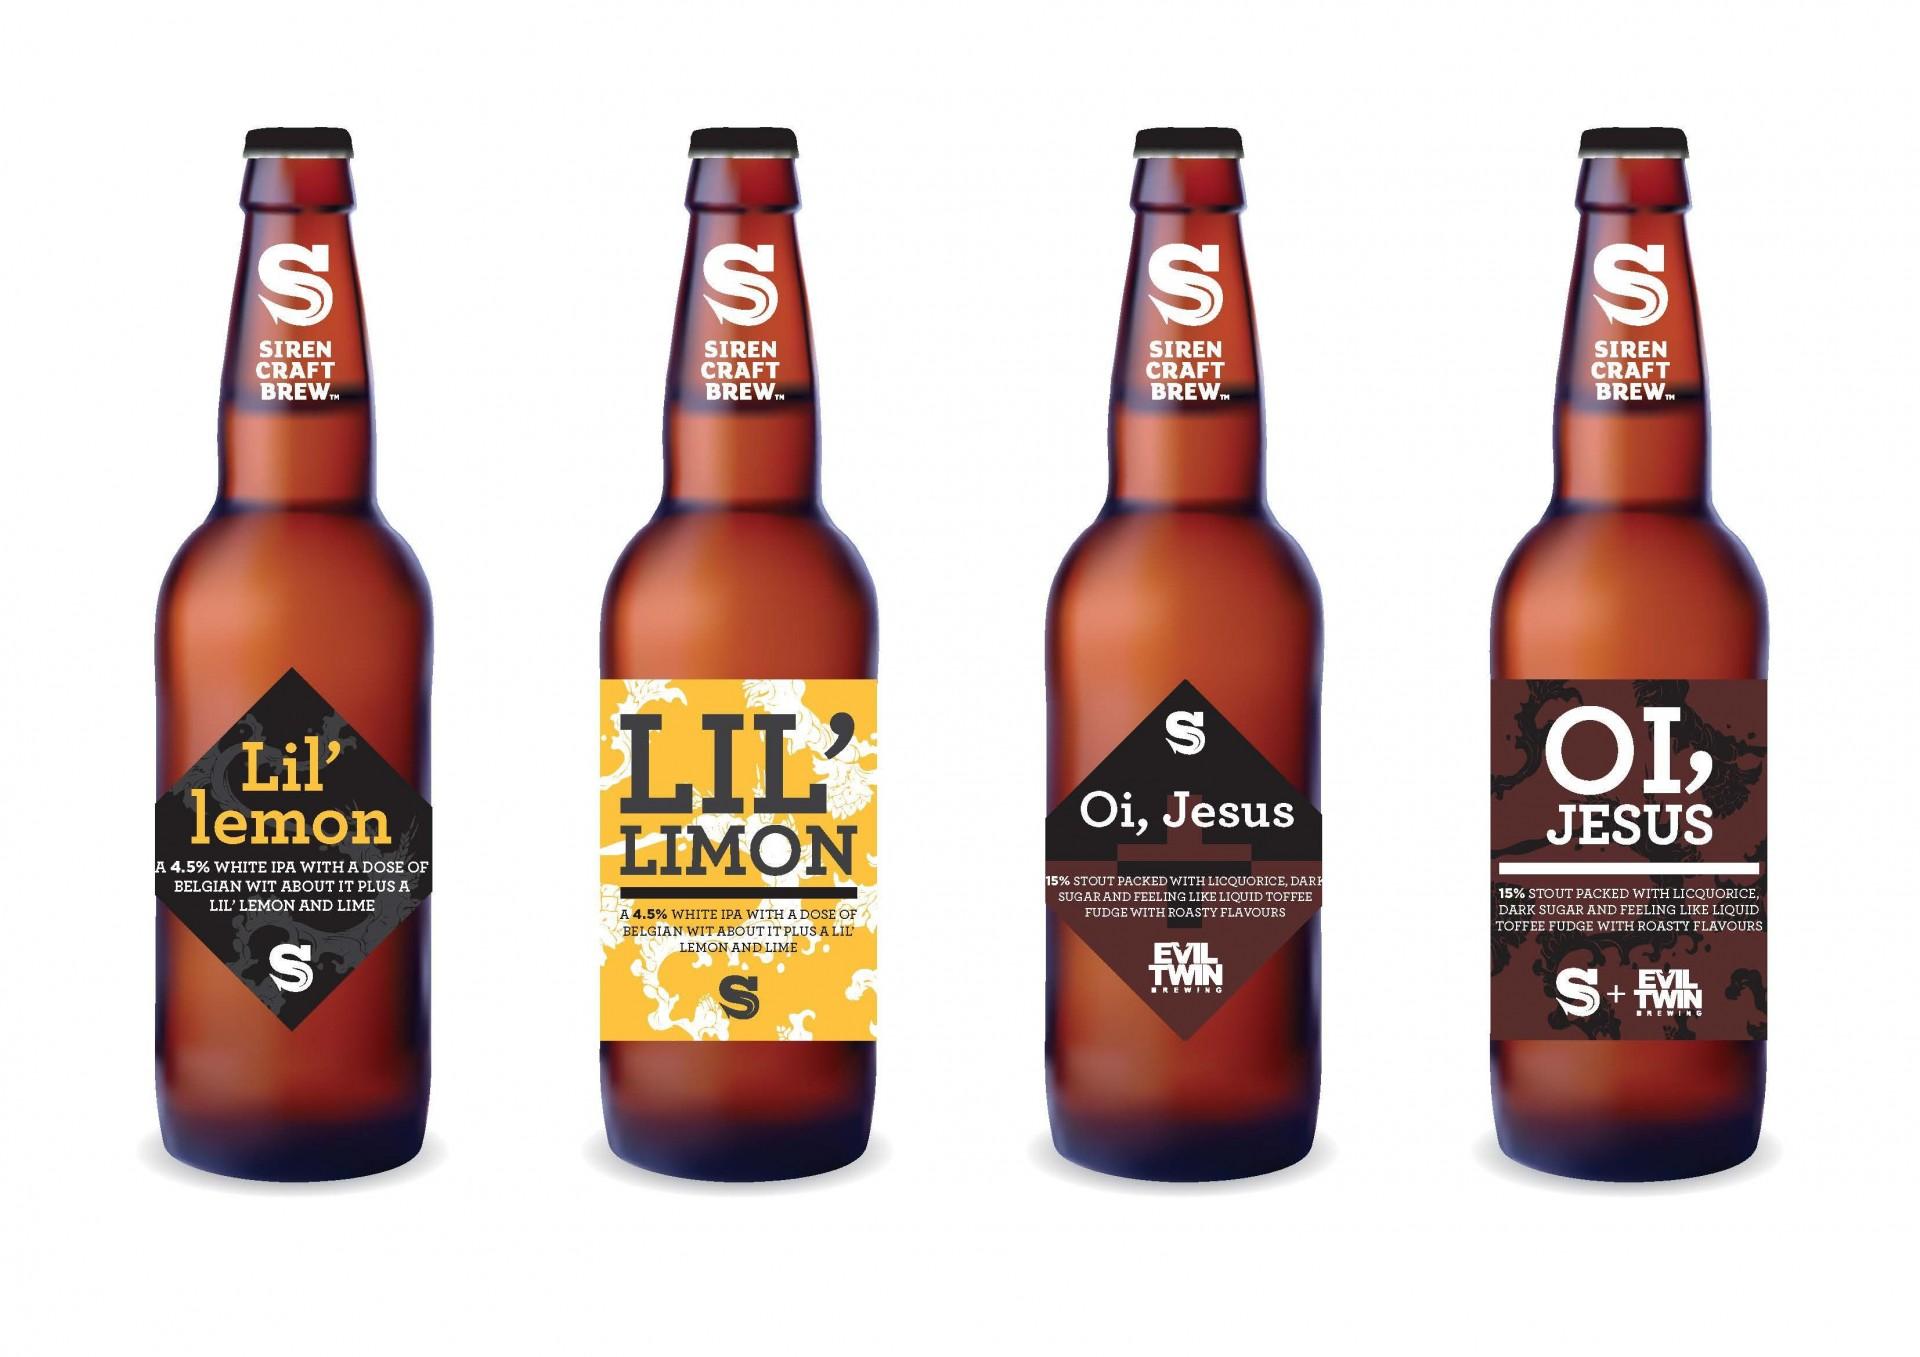 002 Shocking Beer Bottle Label Template Concept  Free Dimension Word1920